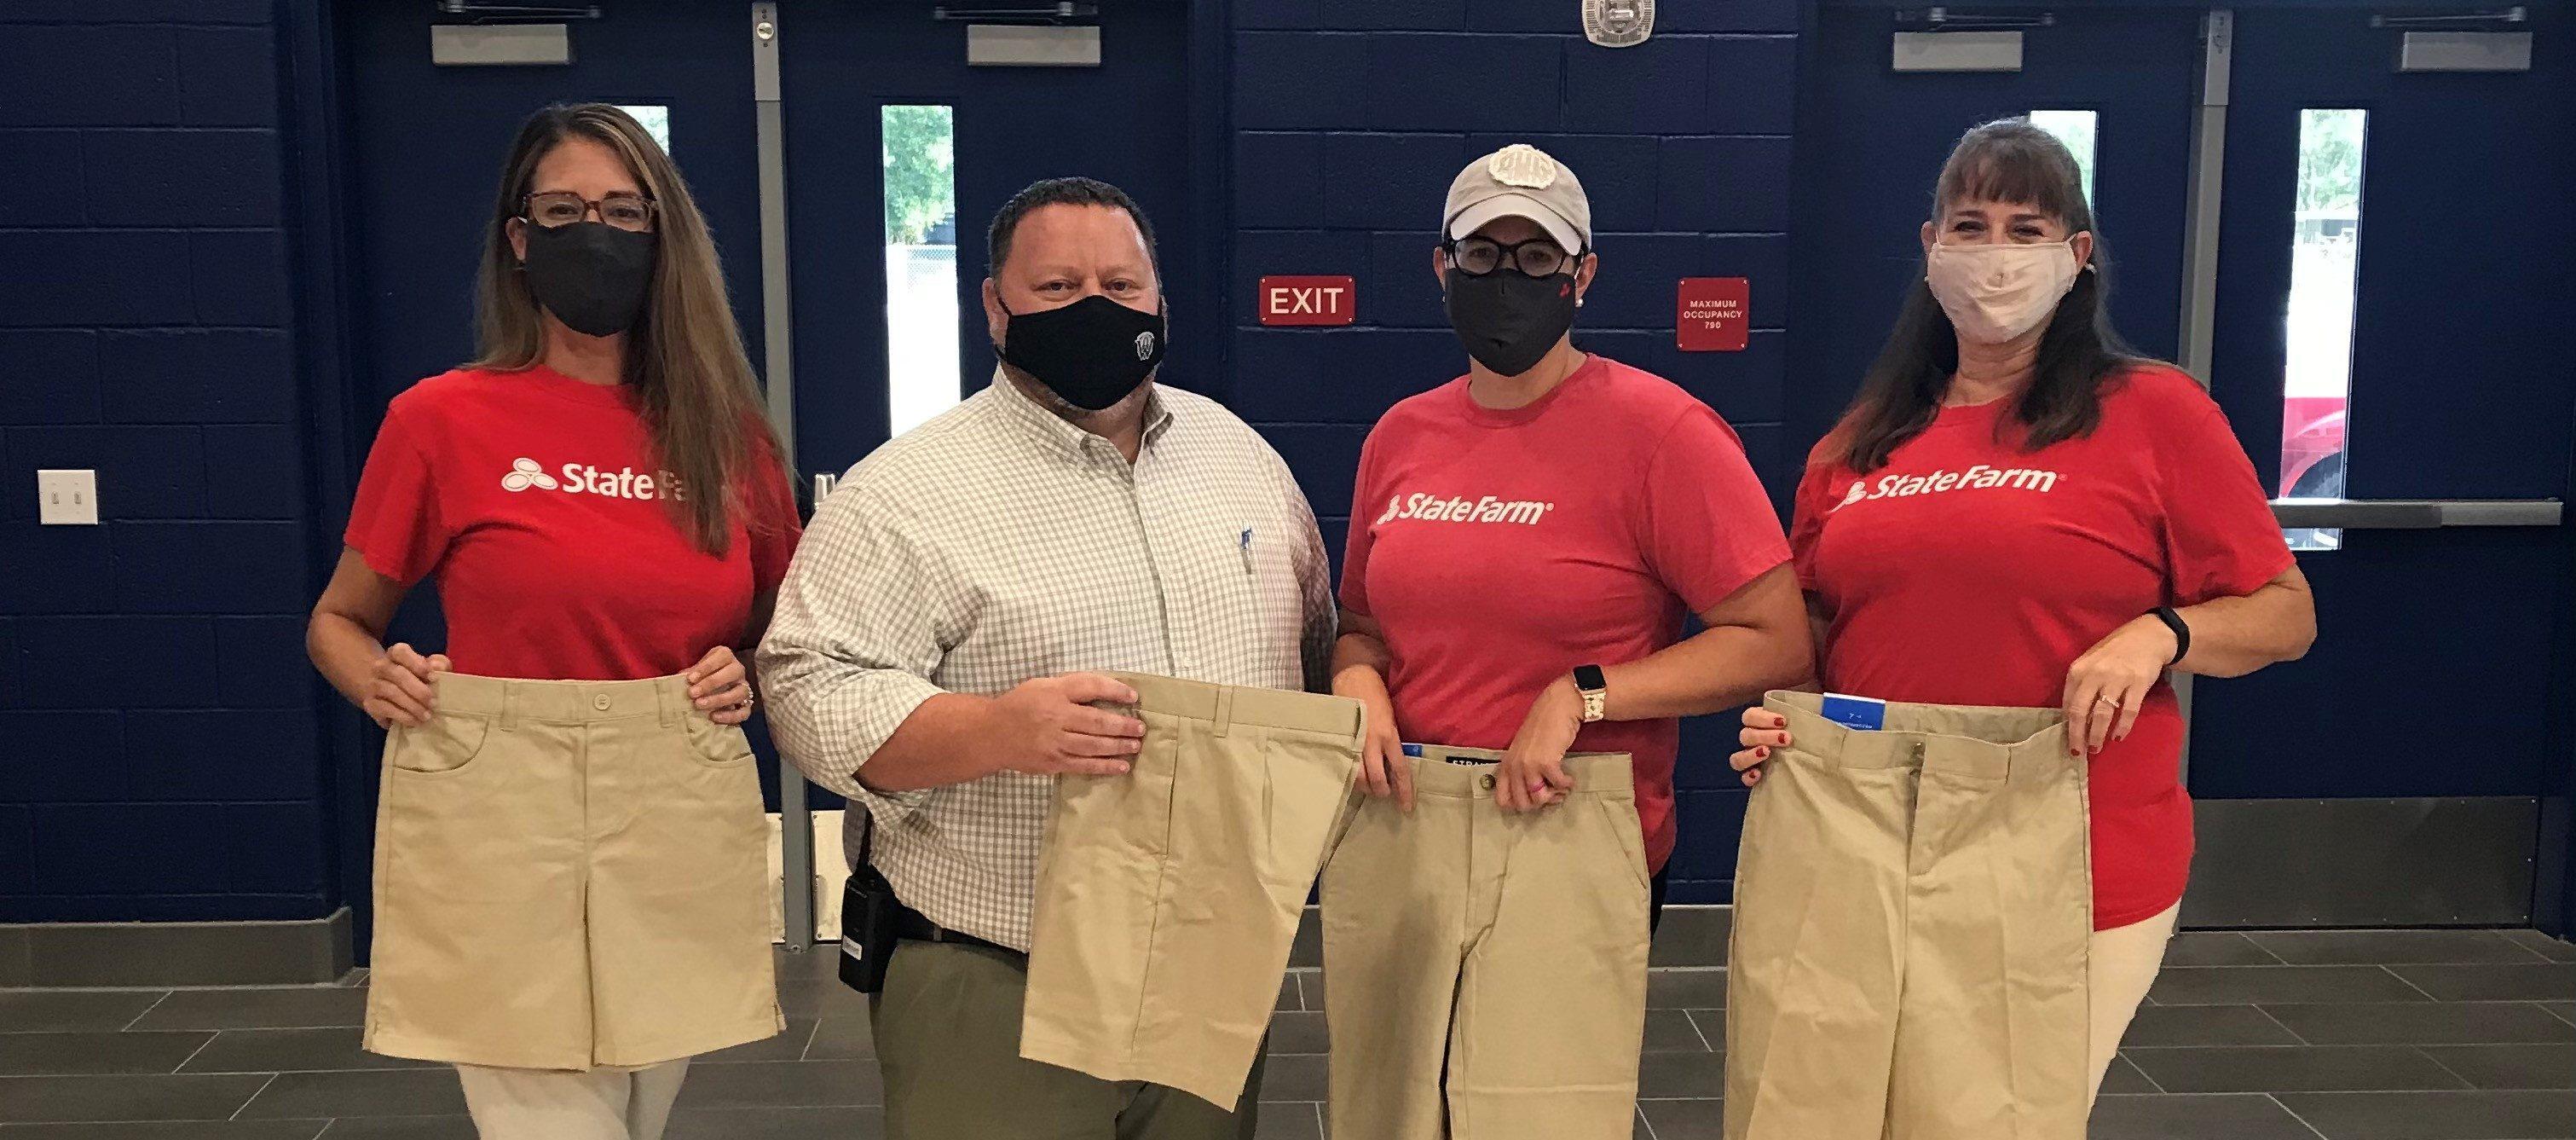 State Farm employees donating khakis to Westwood Middle